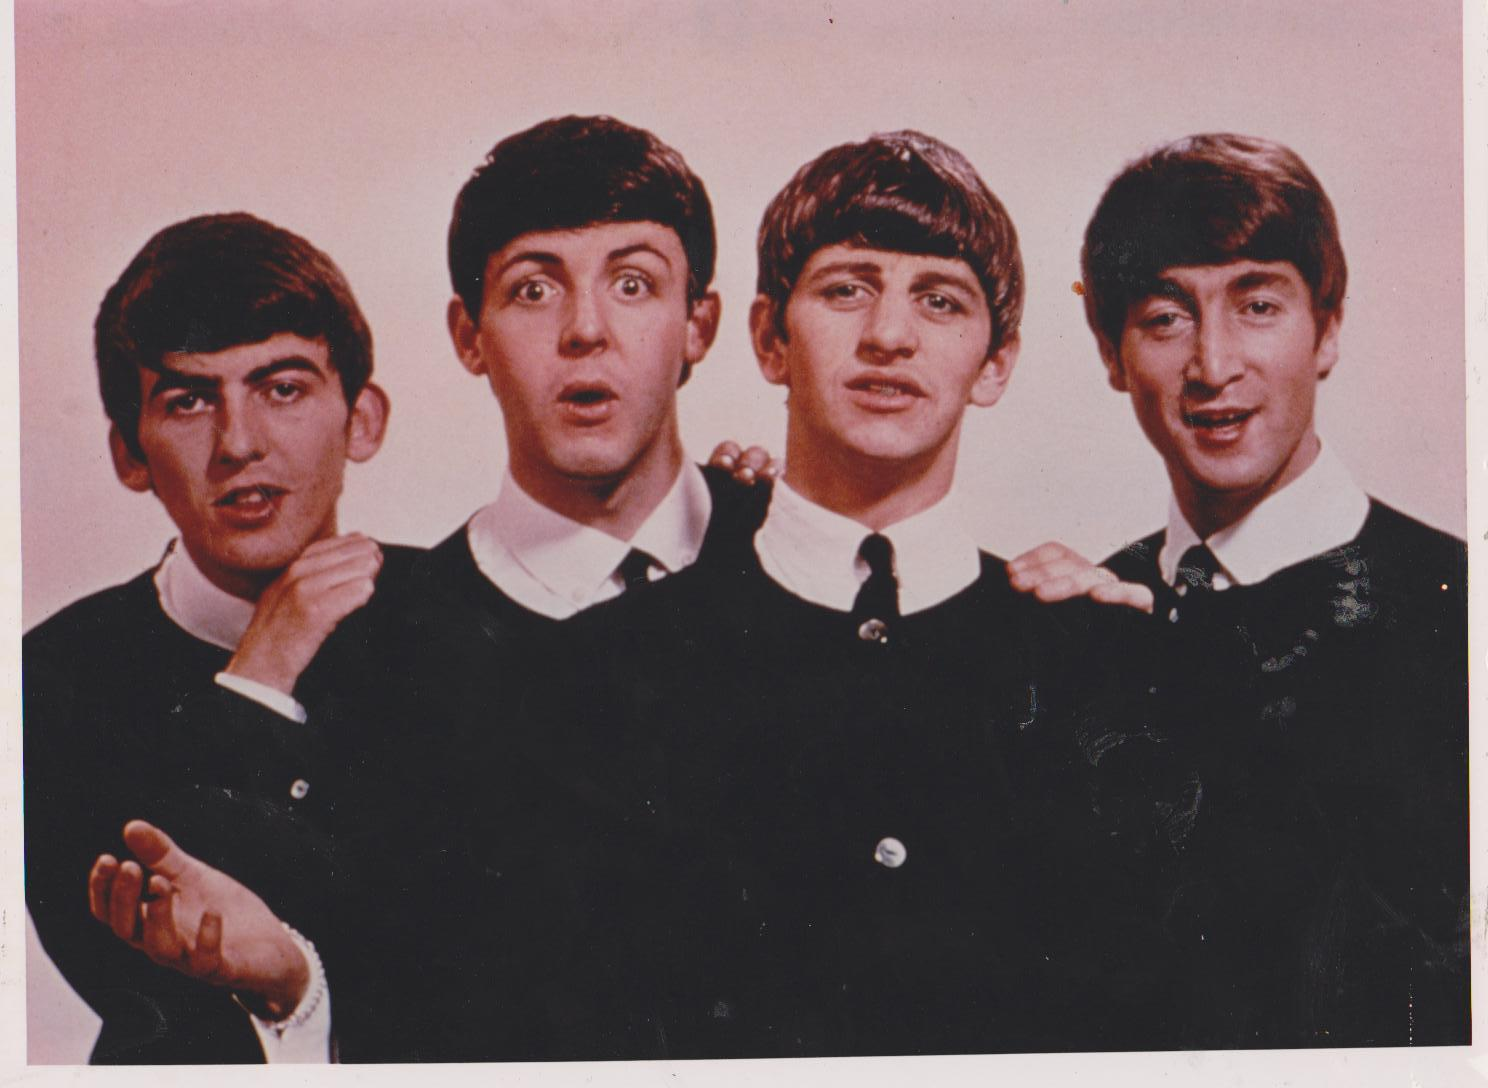 Beatles Paul Mcartney John Lennon Vintage And 50 Similar Items